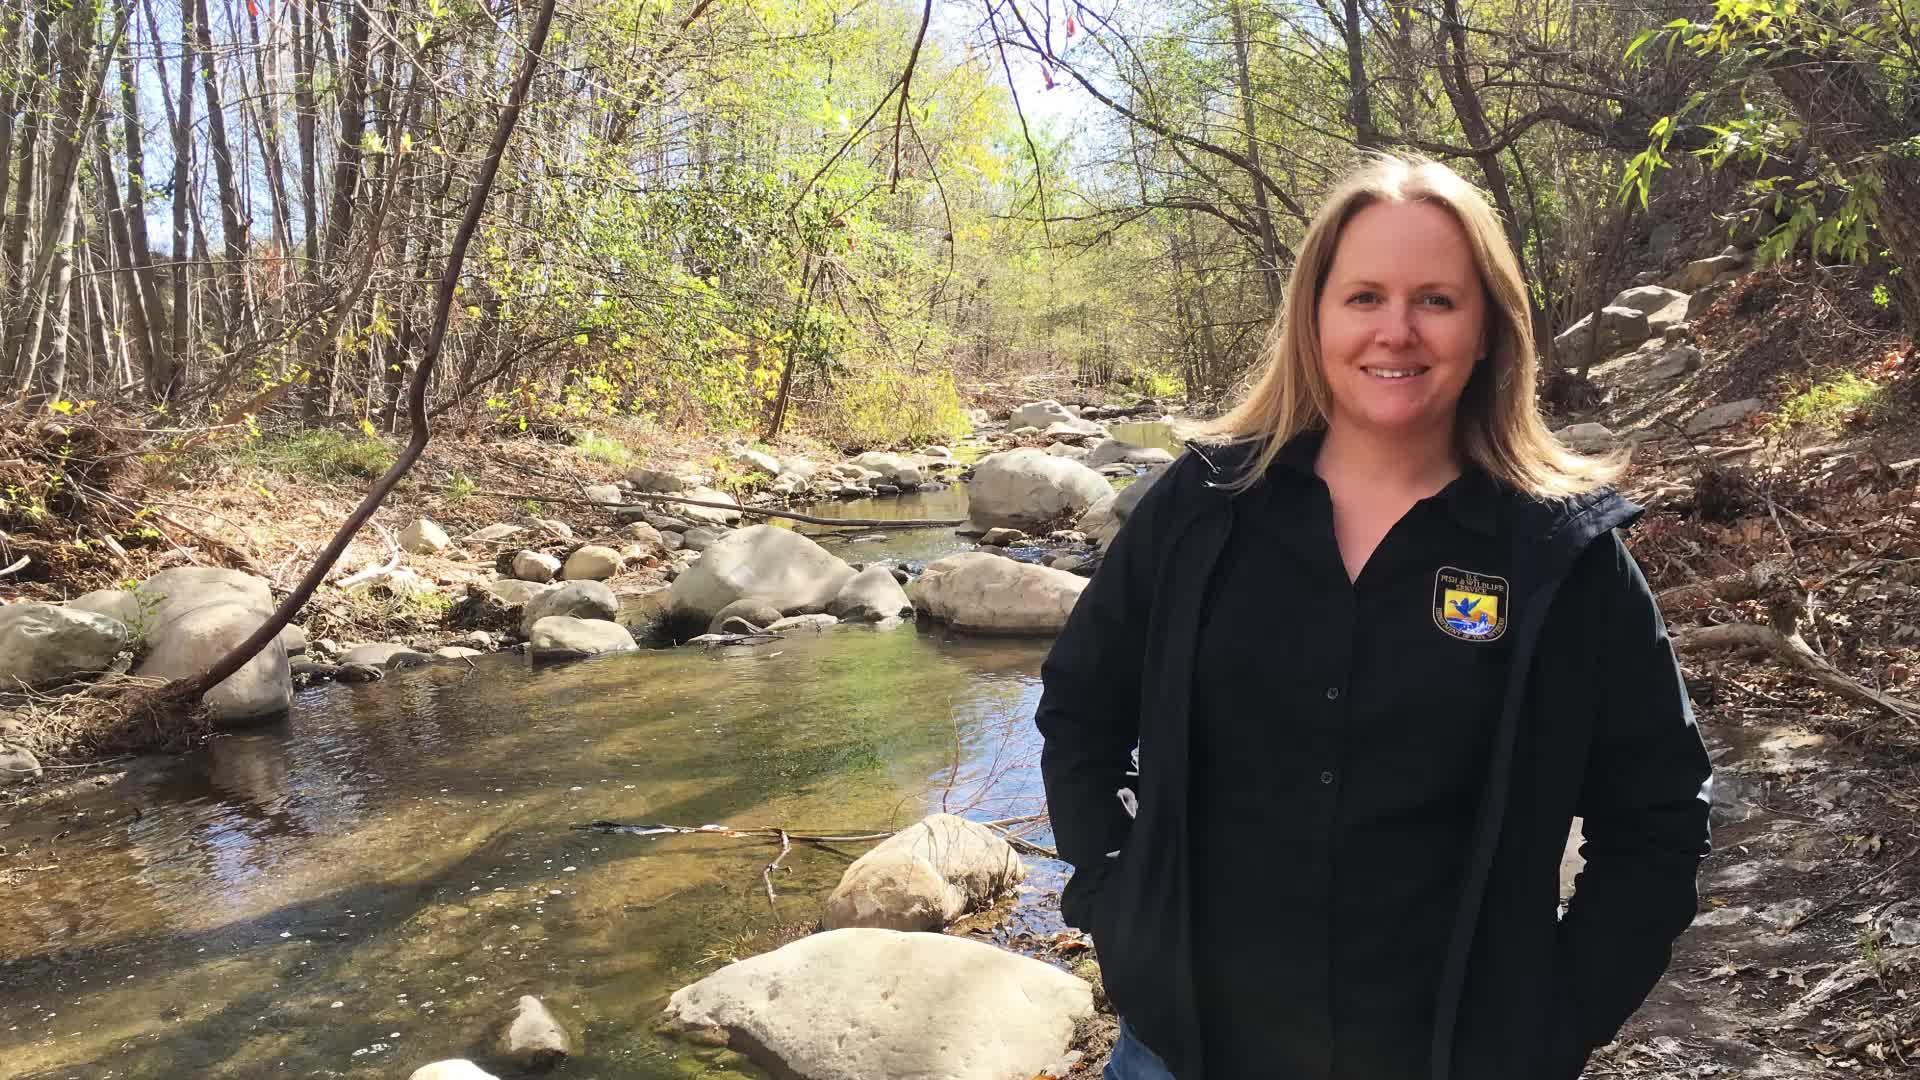 Interview with senior wildlife biologist Jenny Marek